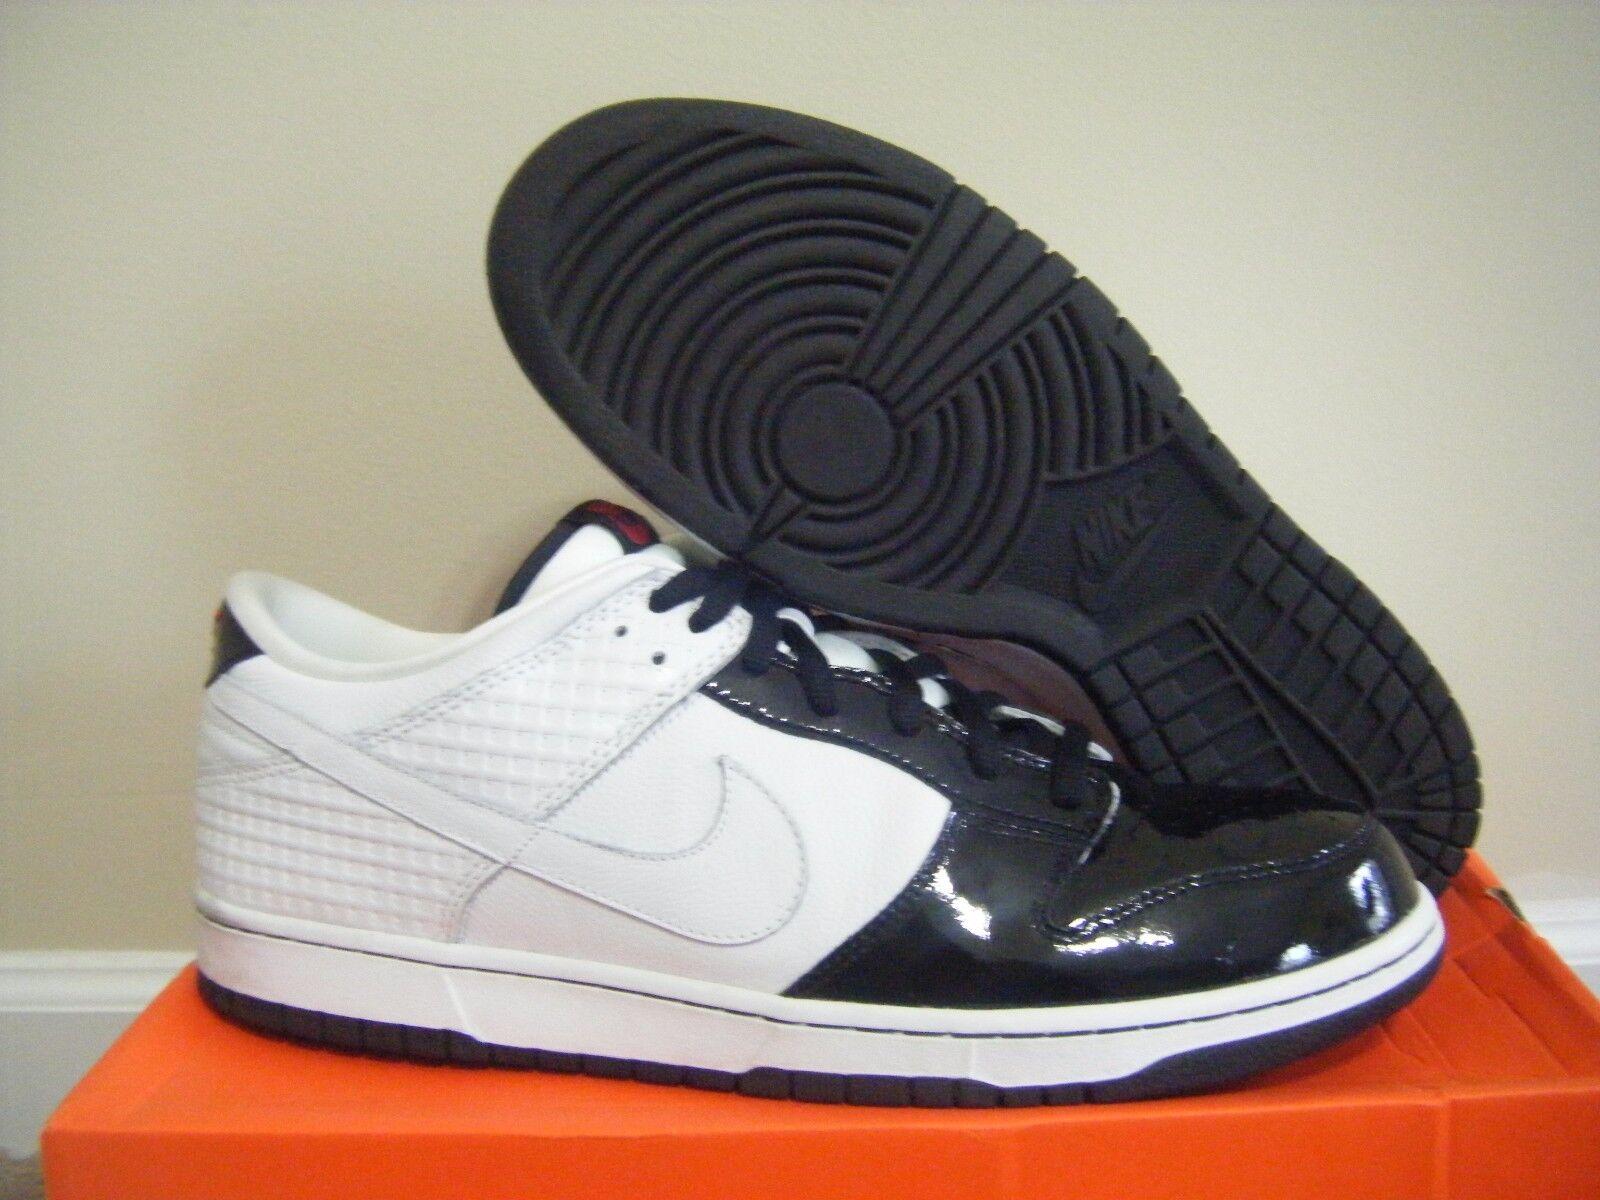 Nike air max 1 id nero / bianco / oro sz 9 camoscio (943756-971)